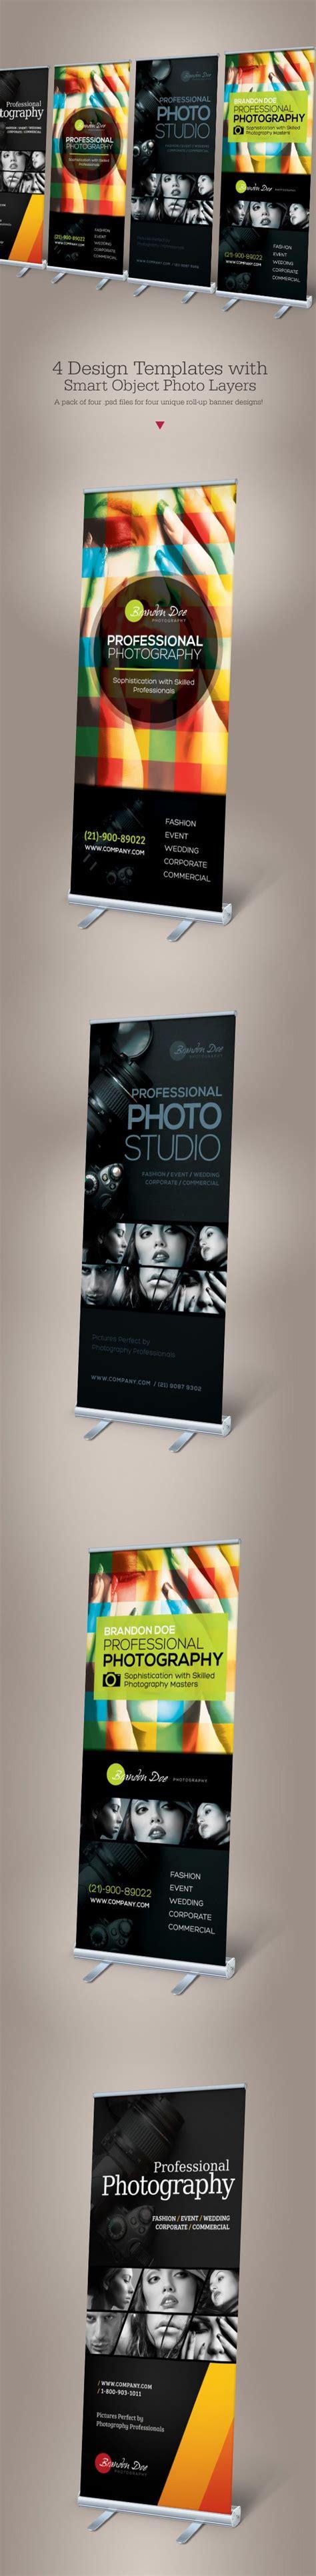 banner design on behance 17 best images about banner roll up on pinterest behance